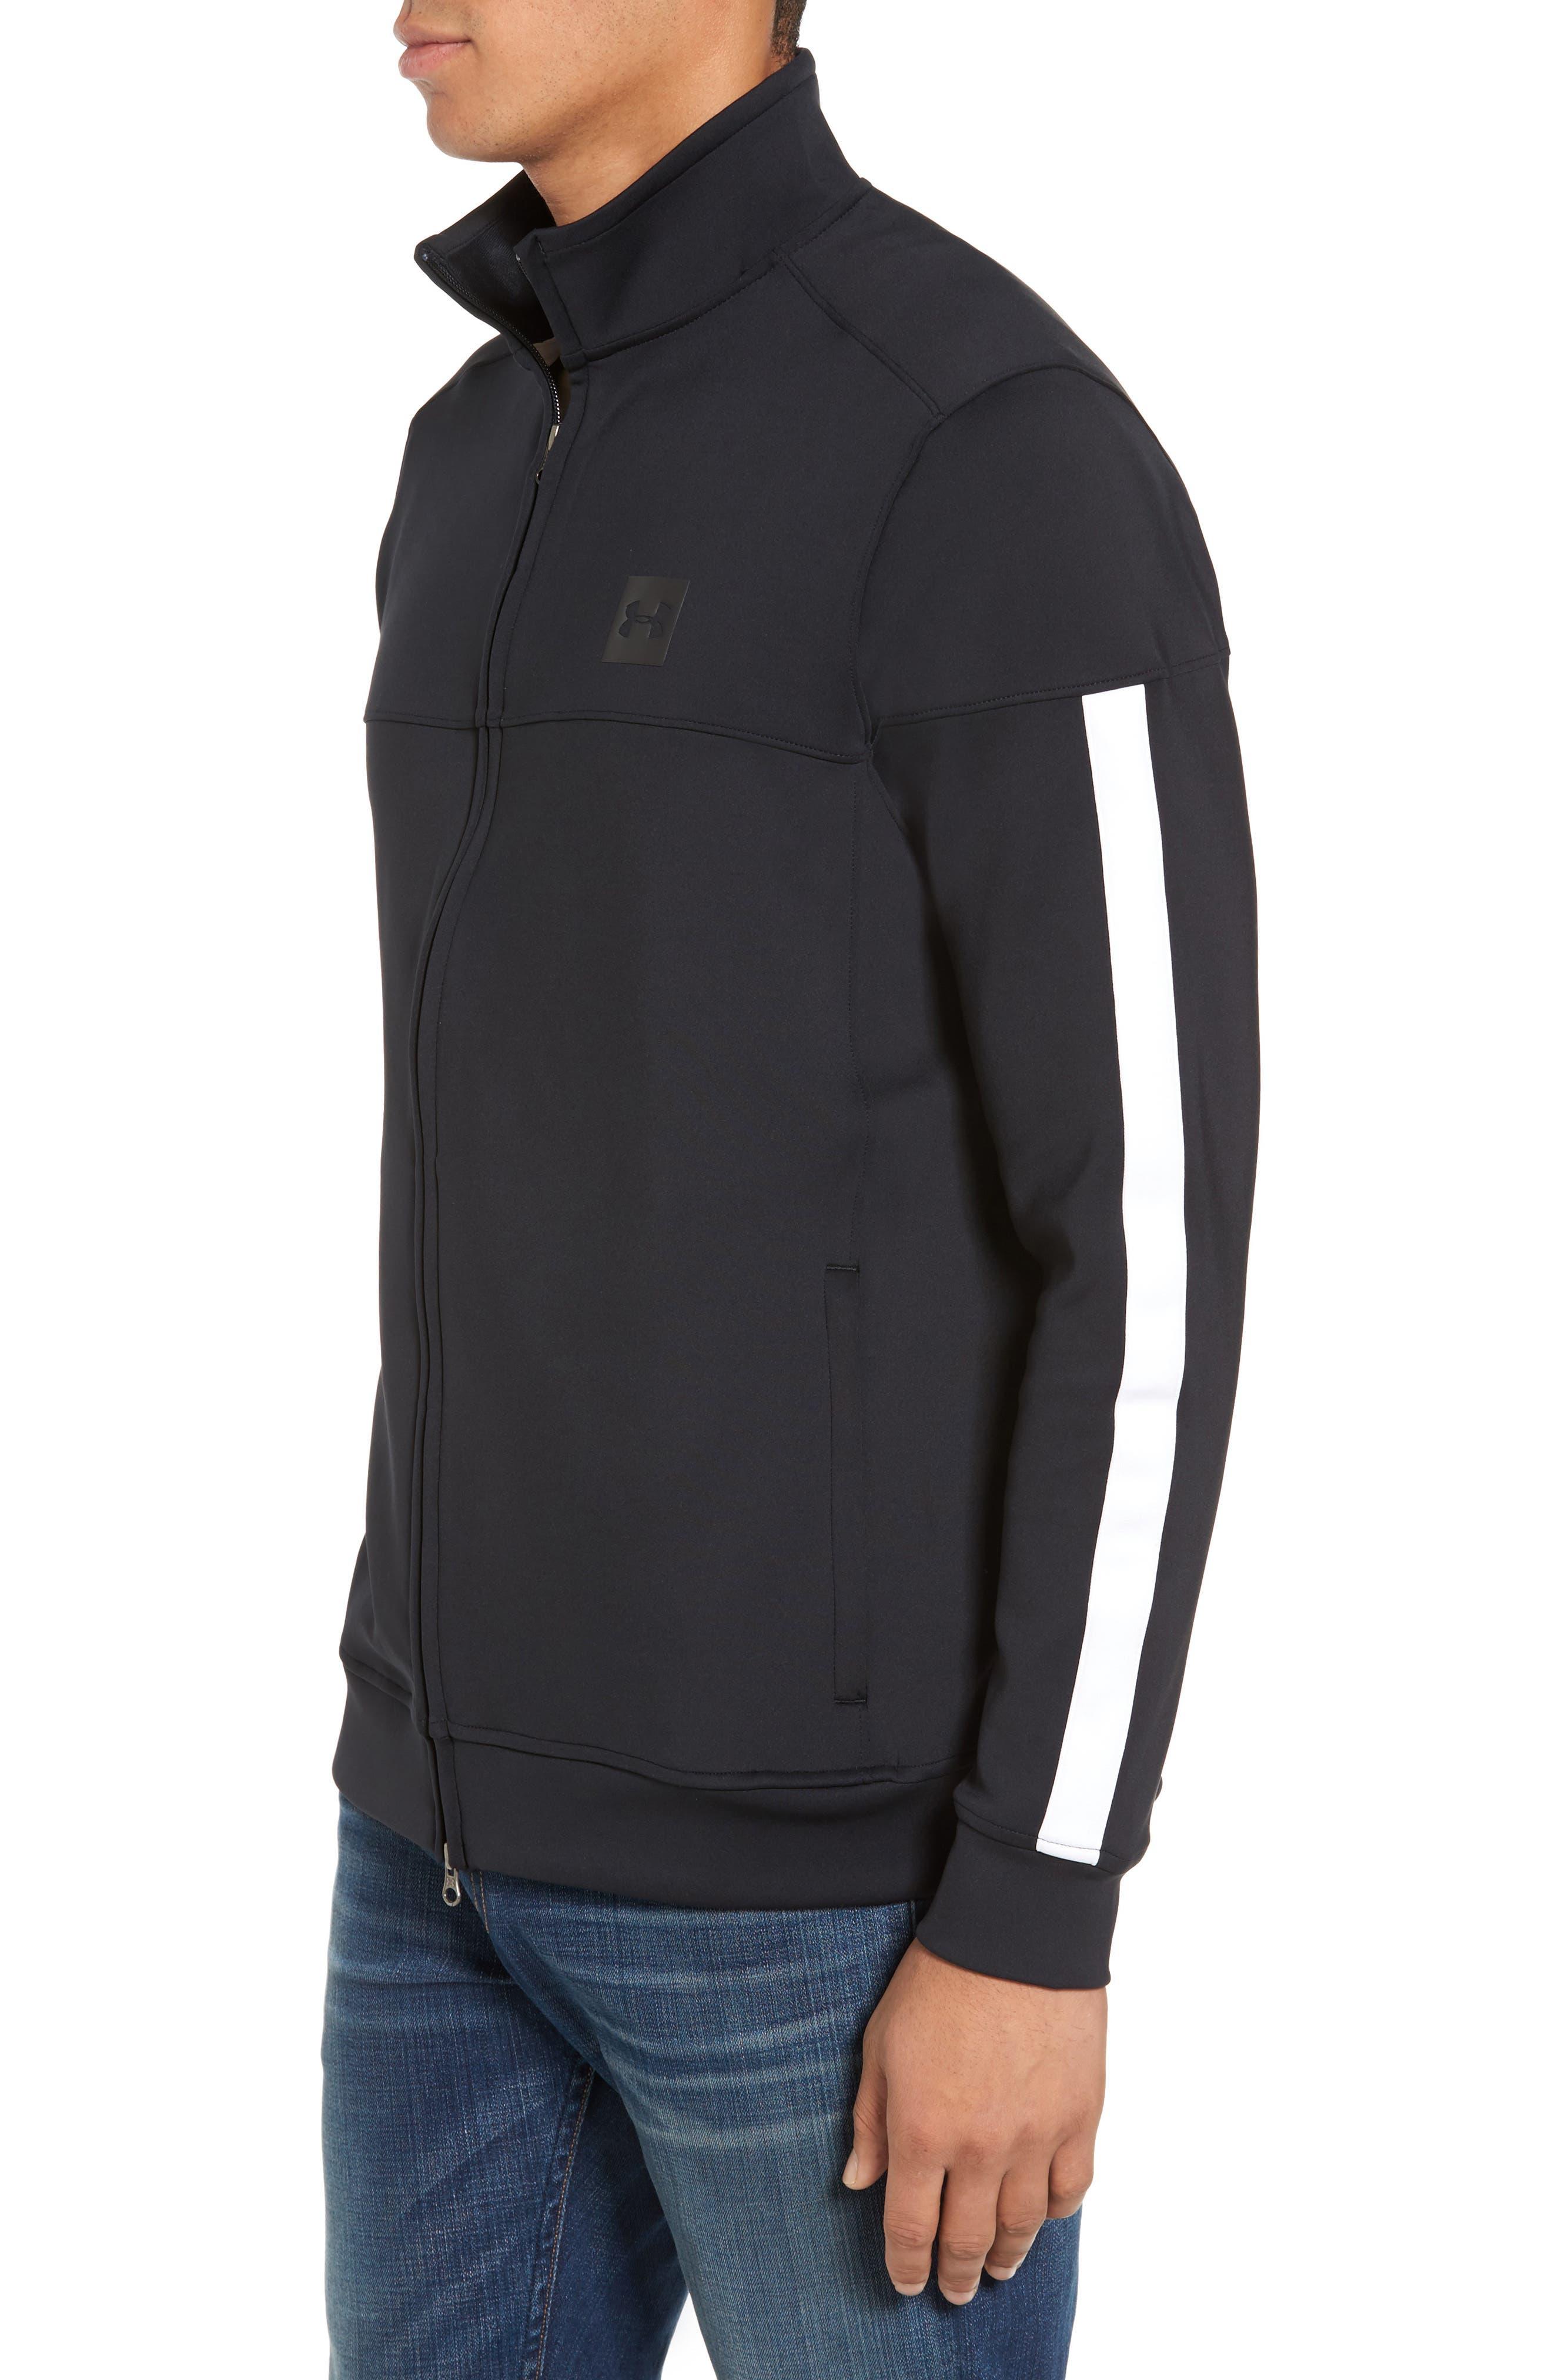 Sportstyle Track Jacket,                             Alternate thumbnail 3, color,                             Black / / Black